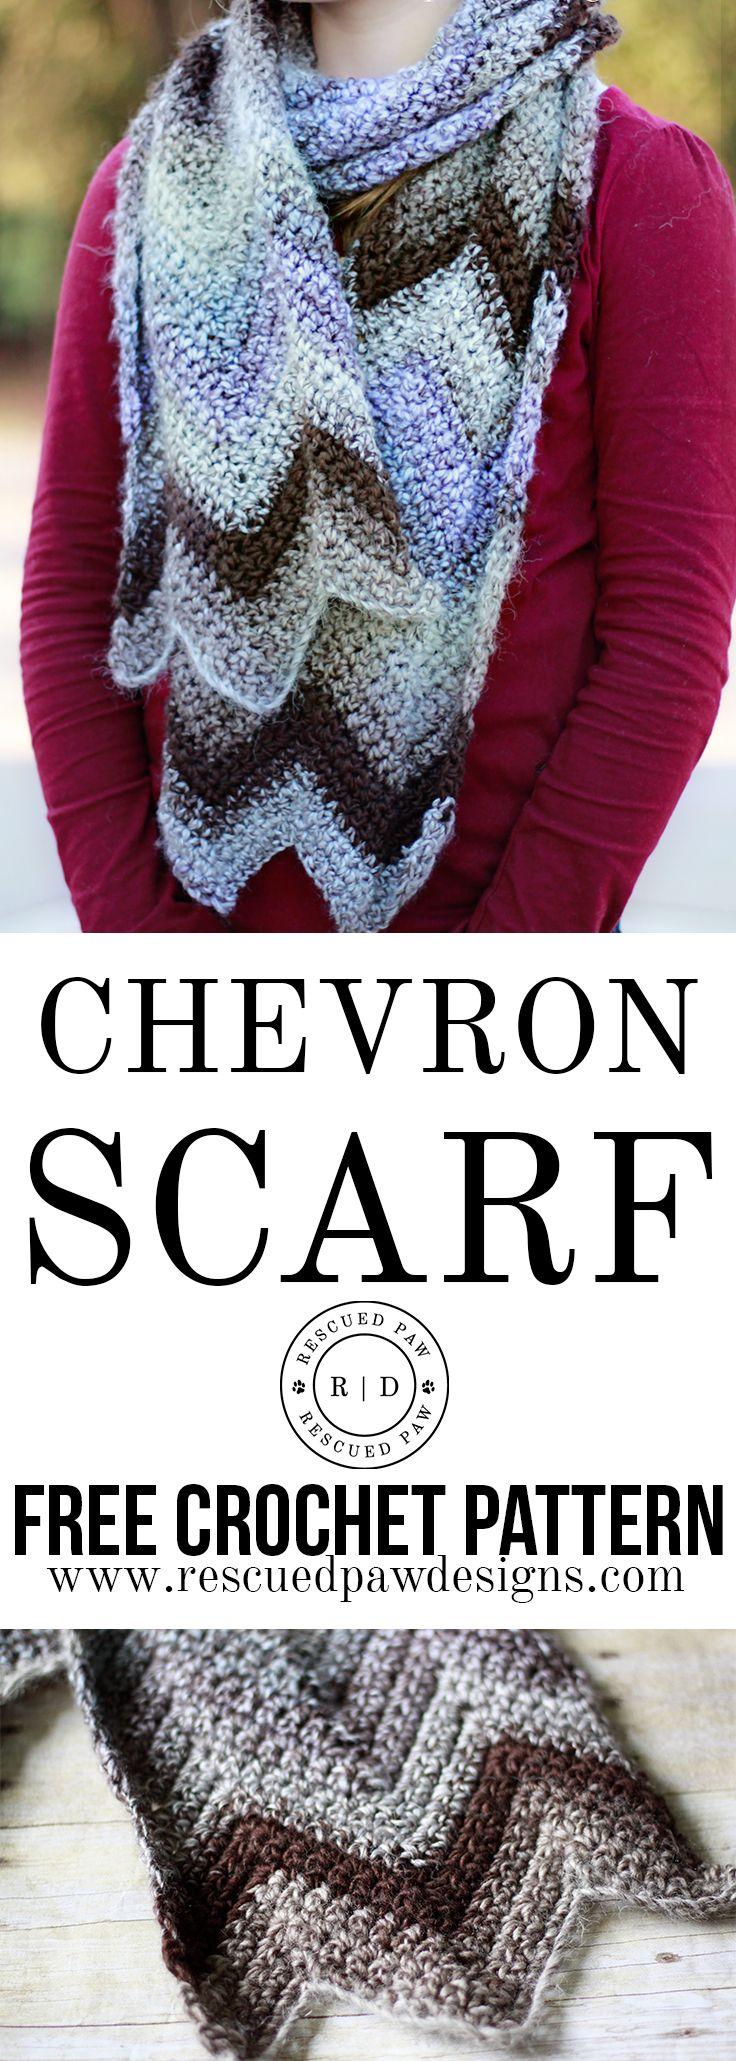 Crochet Chevron Scarf Pattern by Rescued Paw Designs